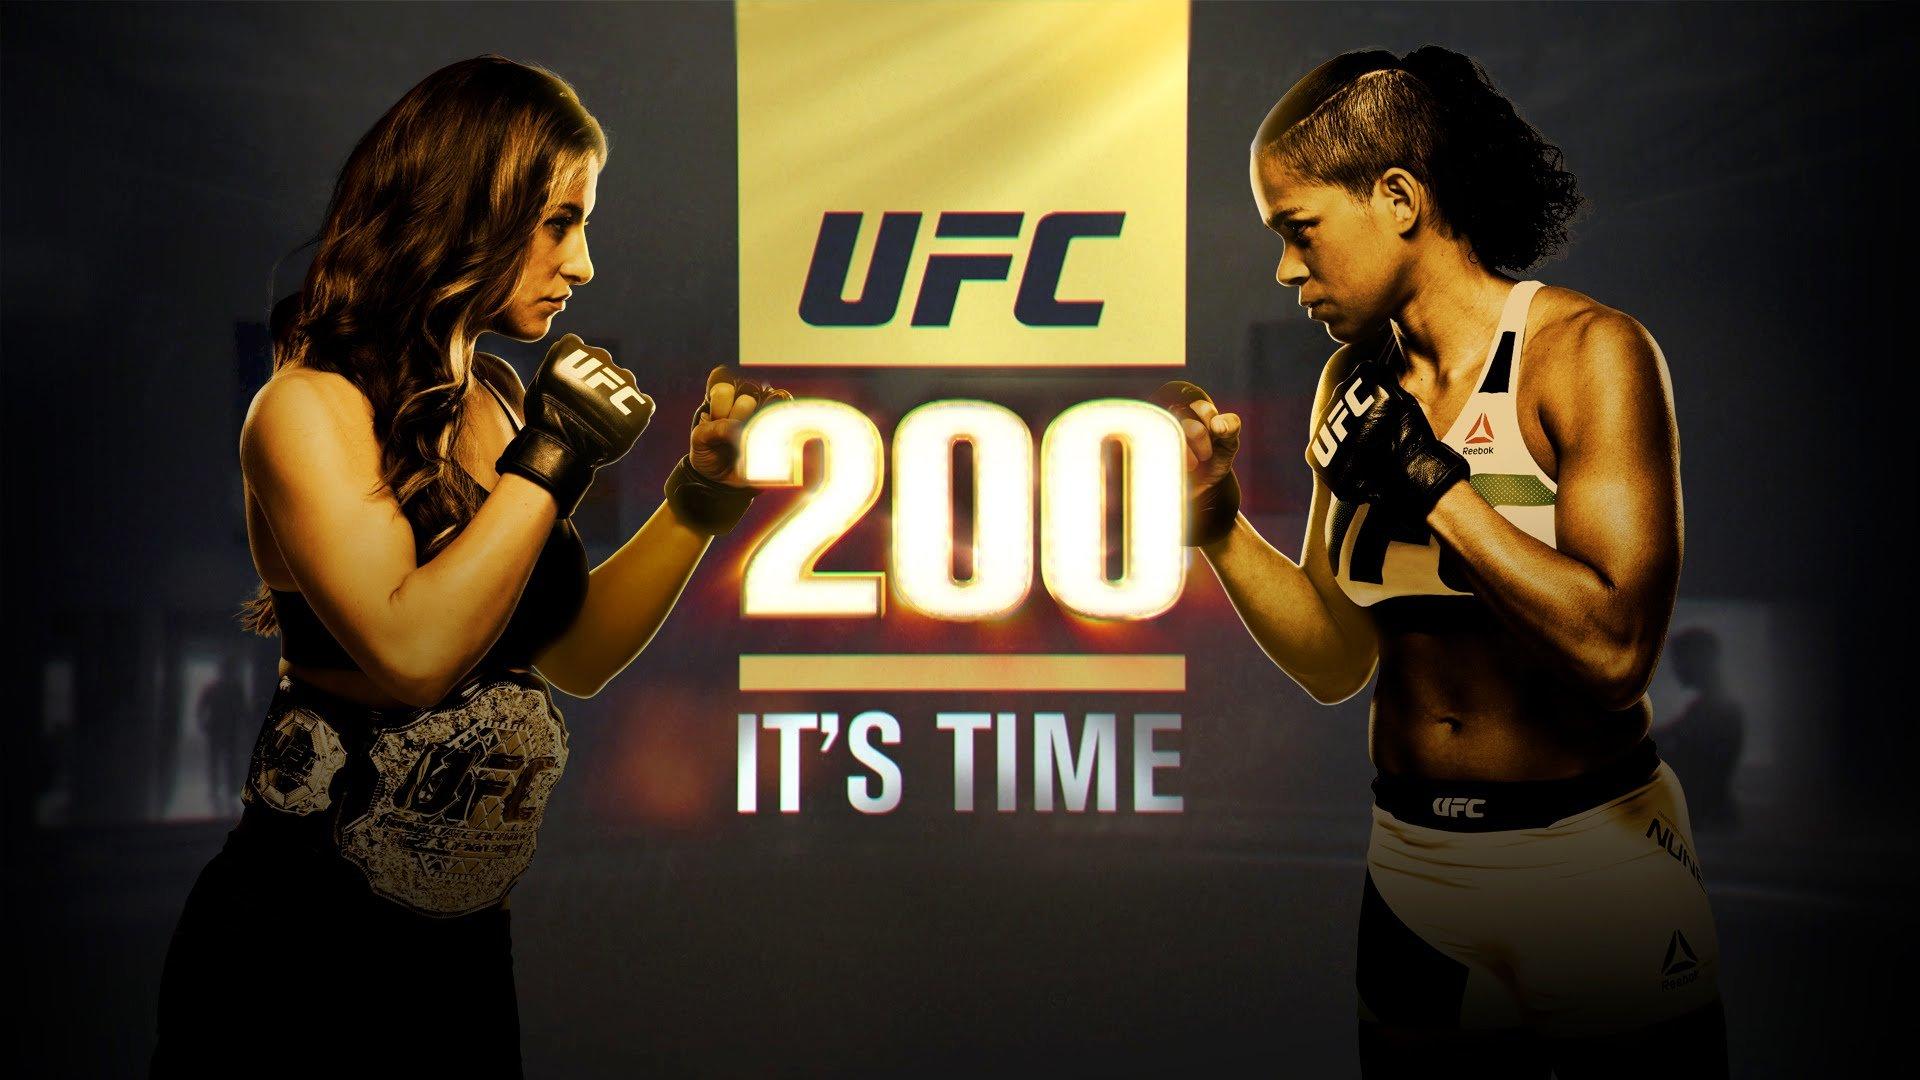 UFC 200 Miesha Tate vs Amanda Nunes poster.